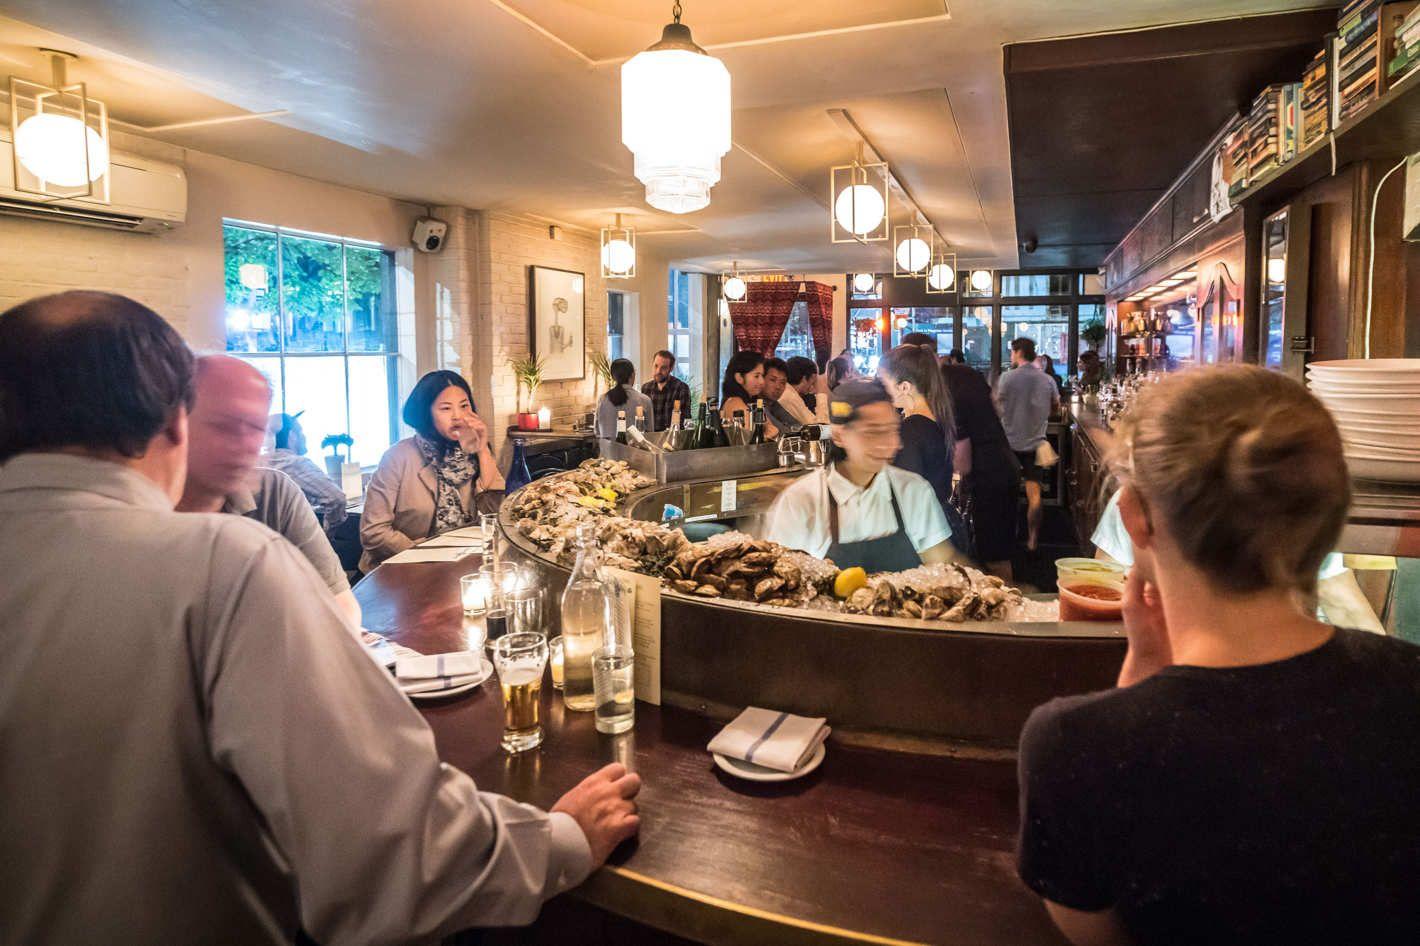 The Absolute Best Restaurants in Park Slope | Park slope ...